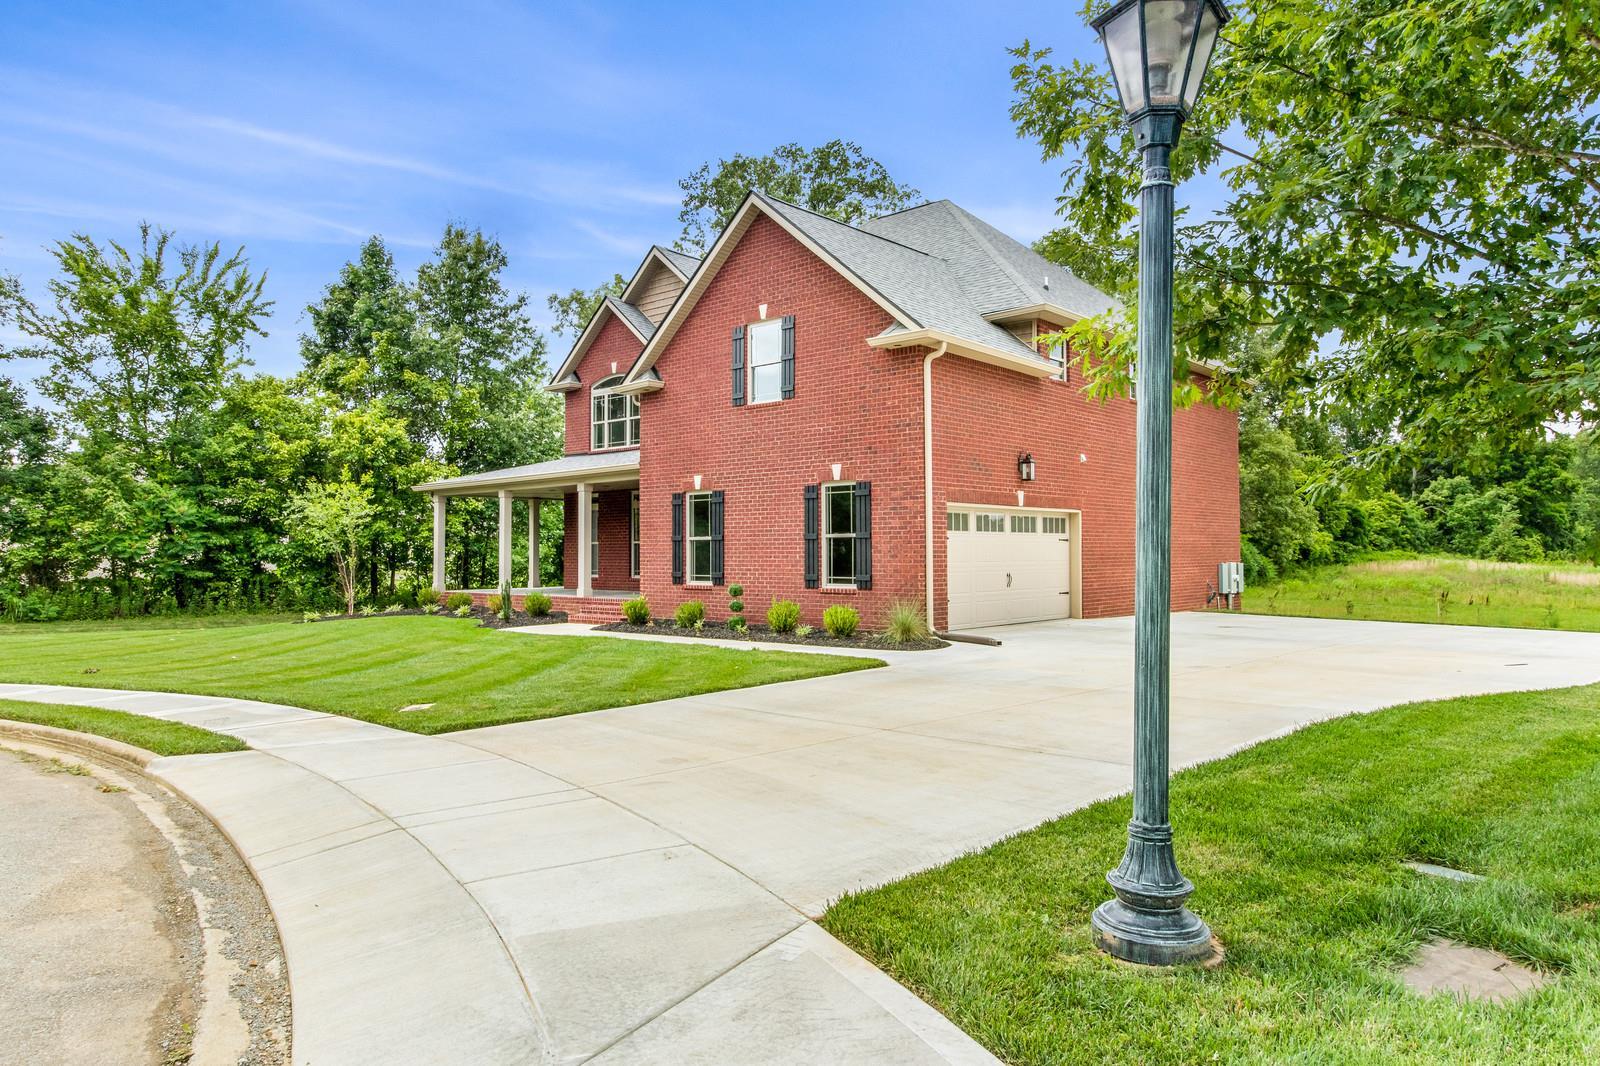 305 Bryson Ln, Clarksville, TN 37043 - Clarksville, TN real estate listing